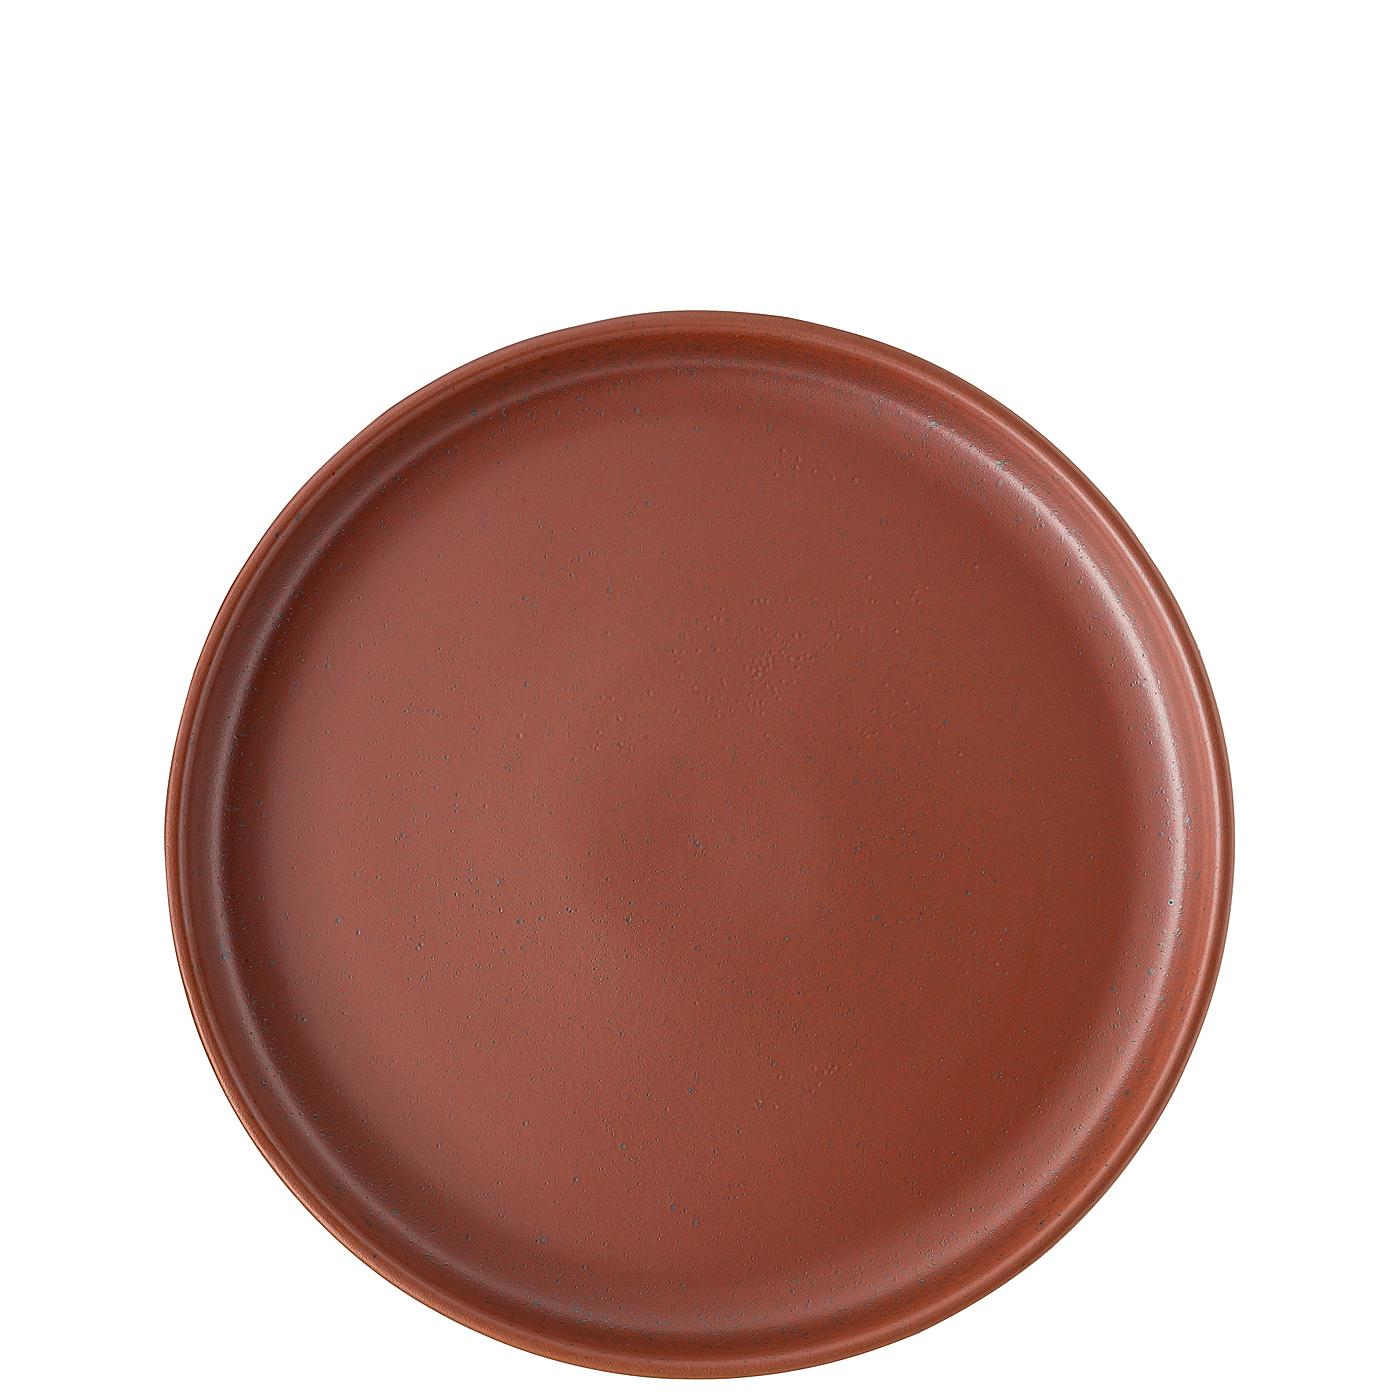 Gourmetteller 26 cm Joyn Stoneware Spark Arzberg